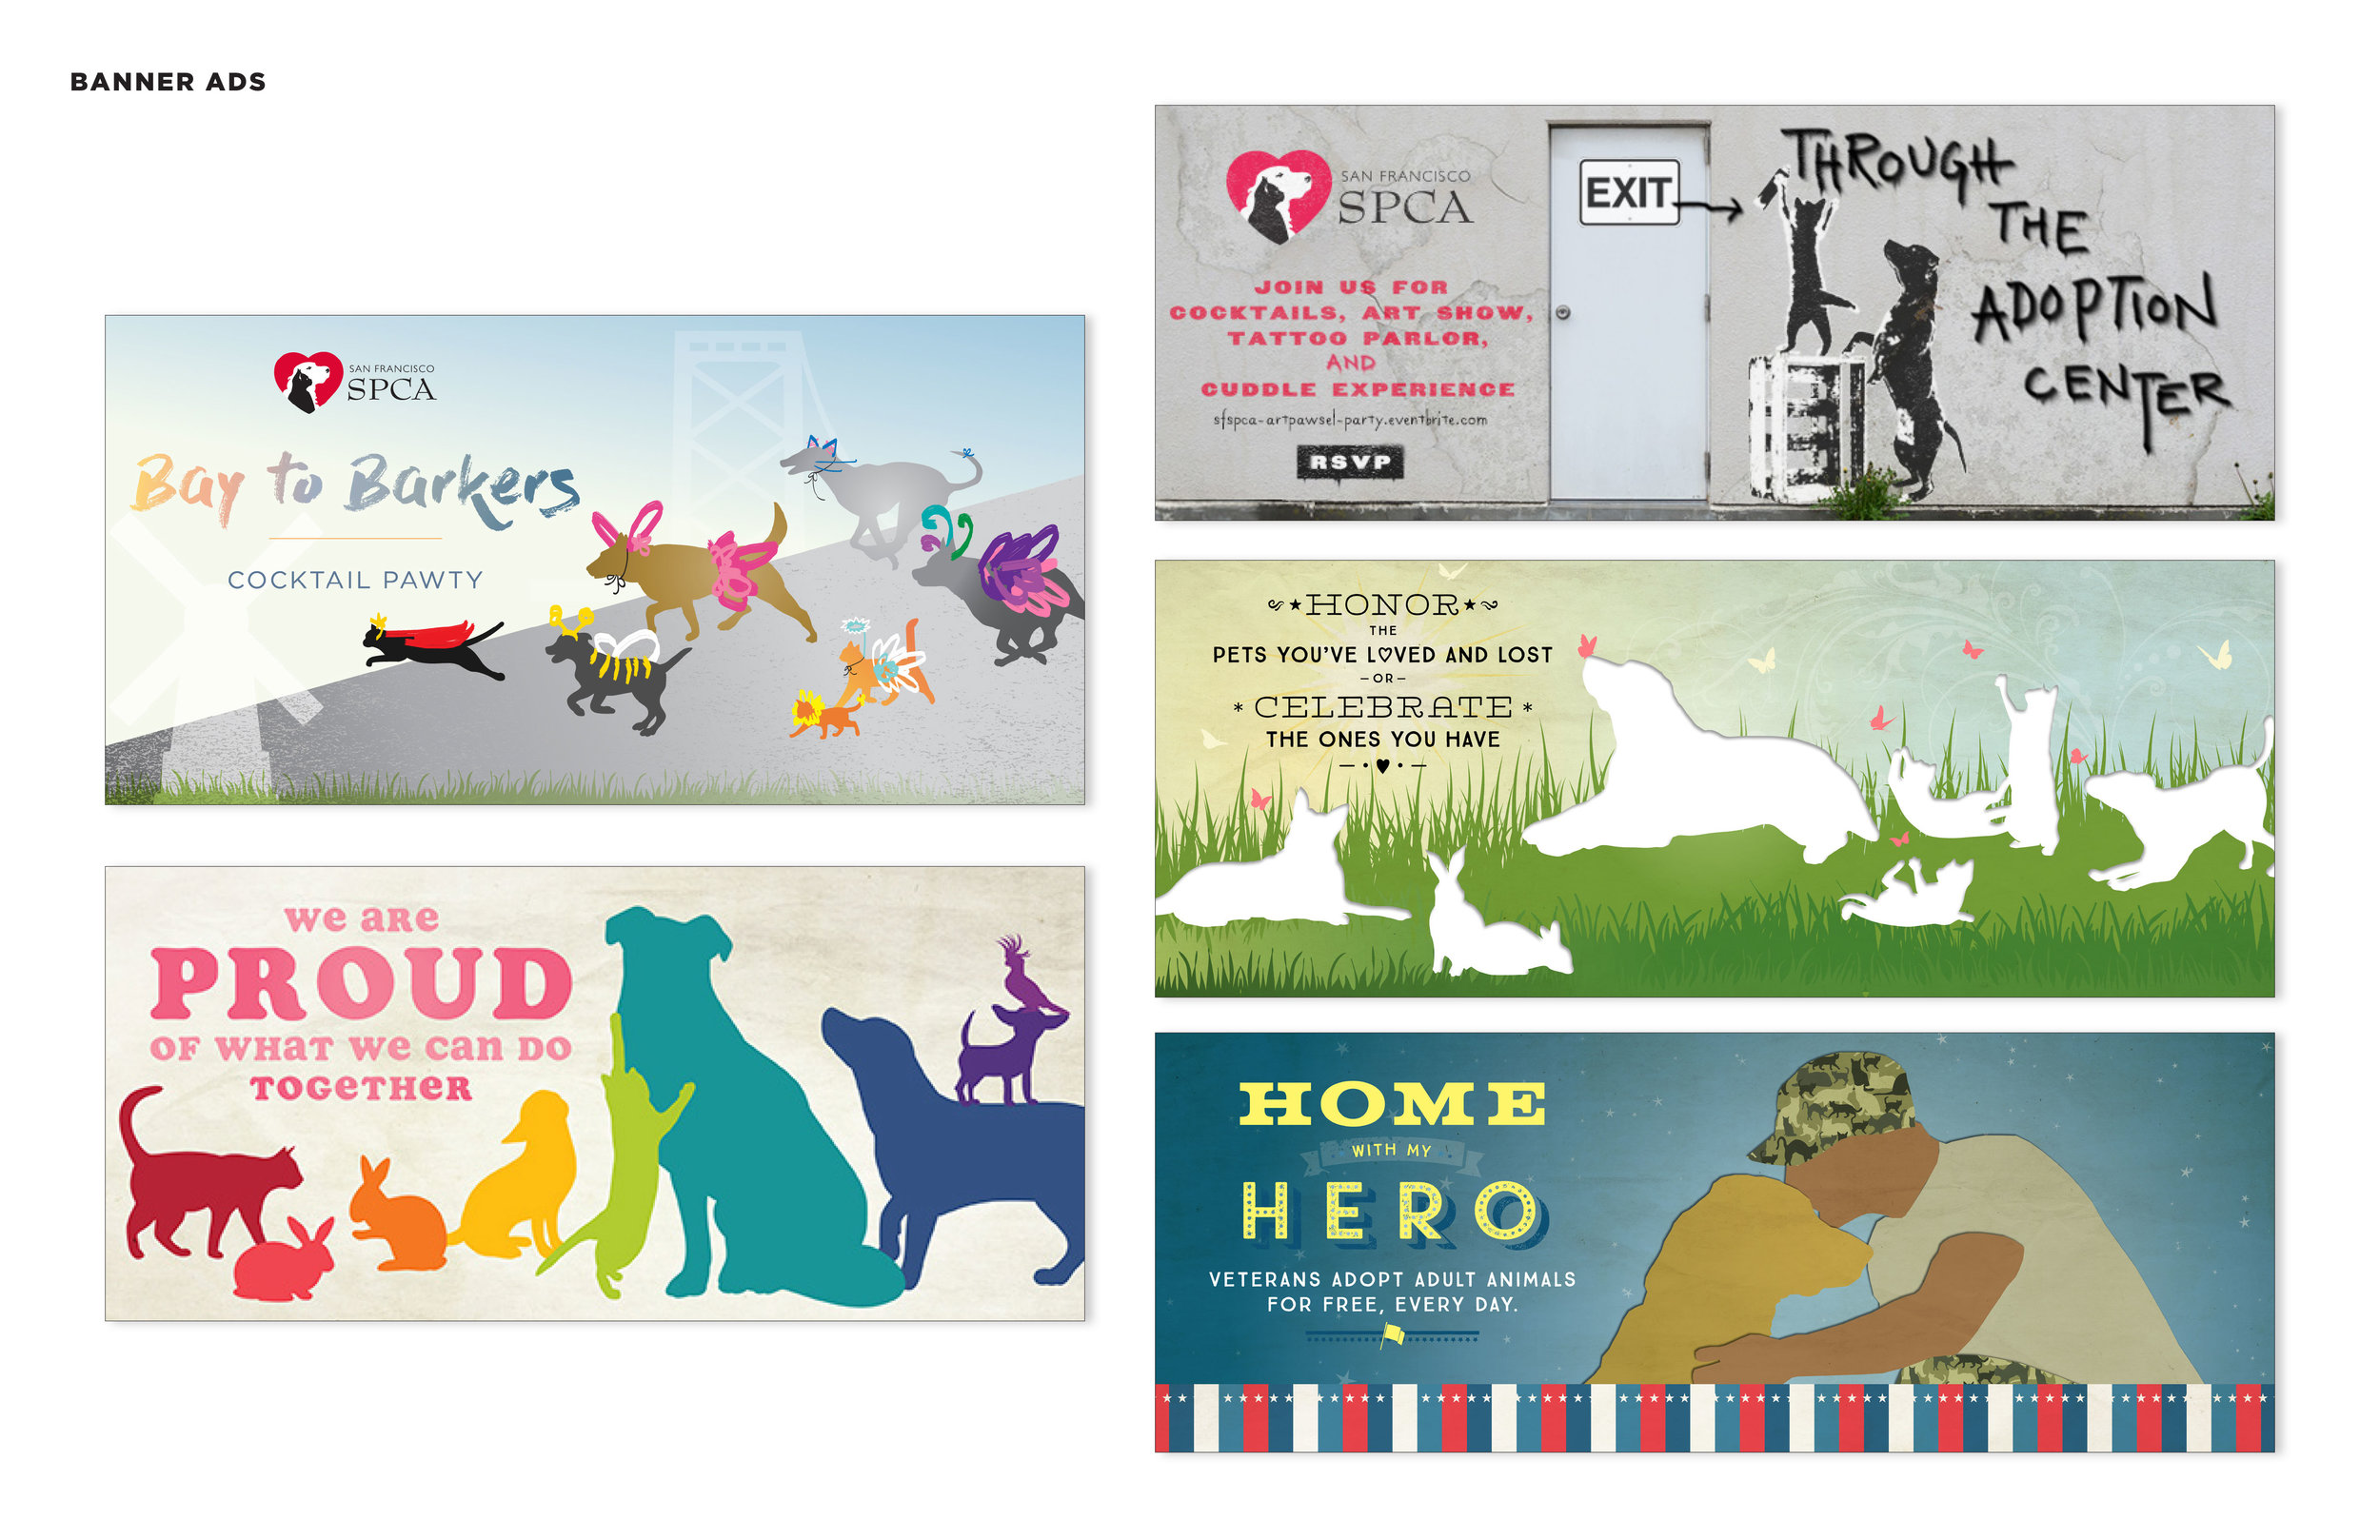 SPCA_banners.jpg